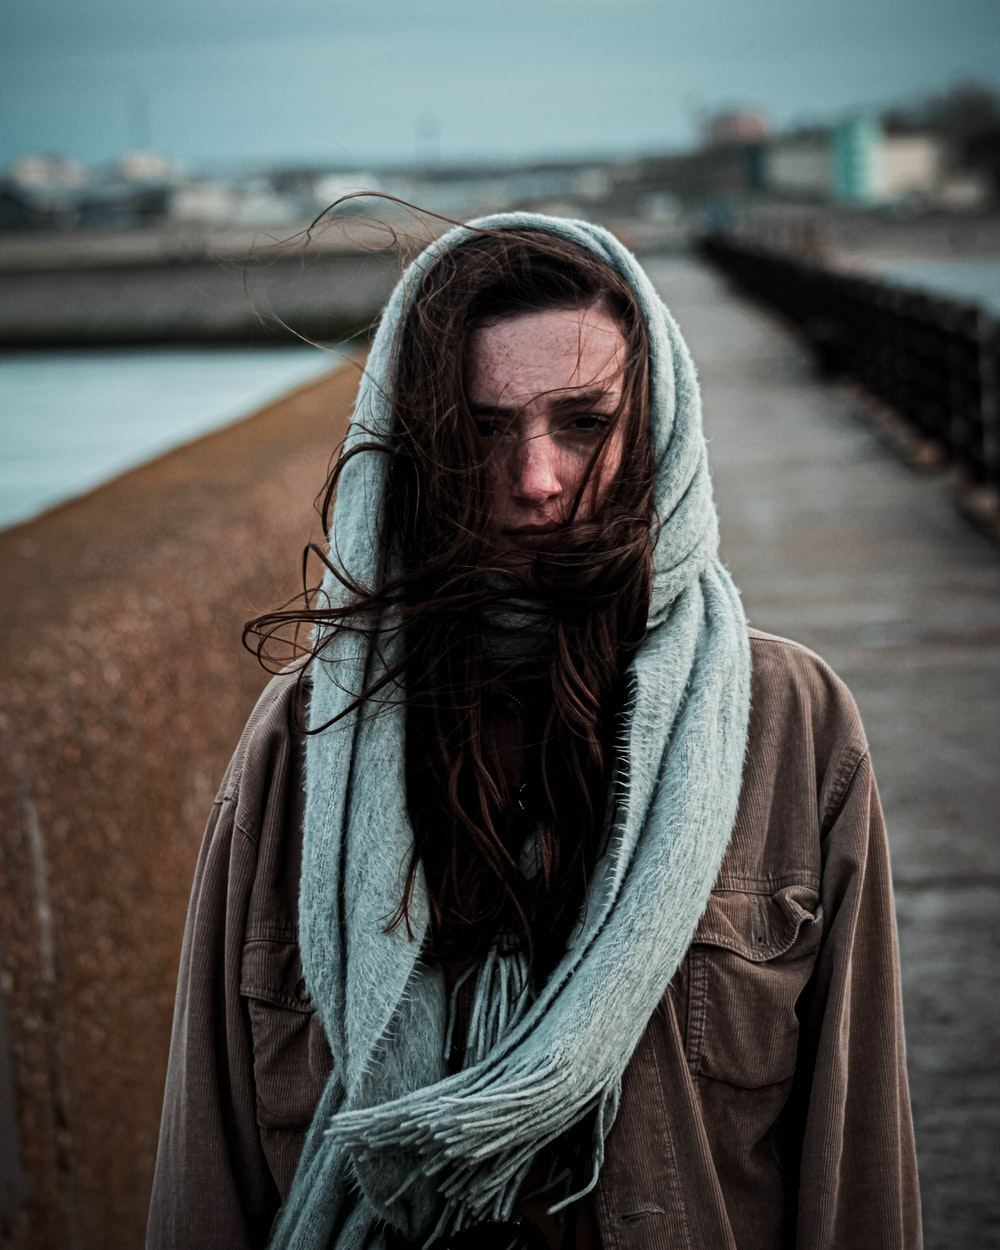 woman in brown coat standing on bridge during daytime